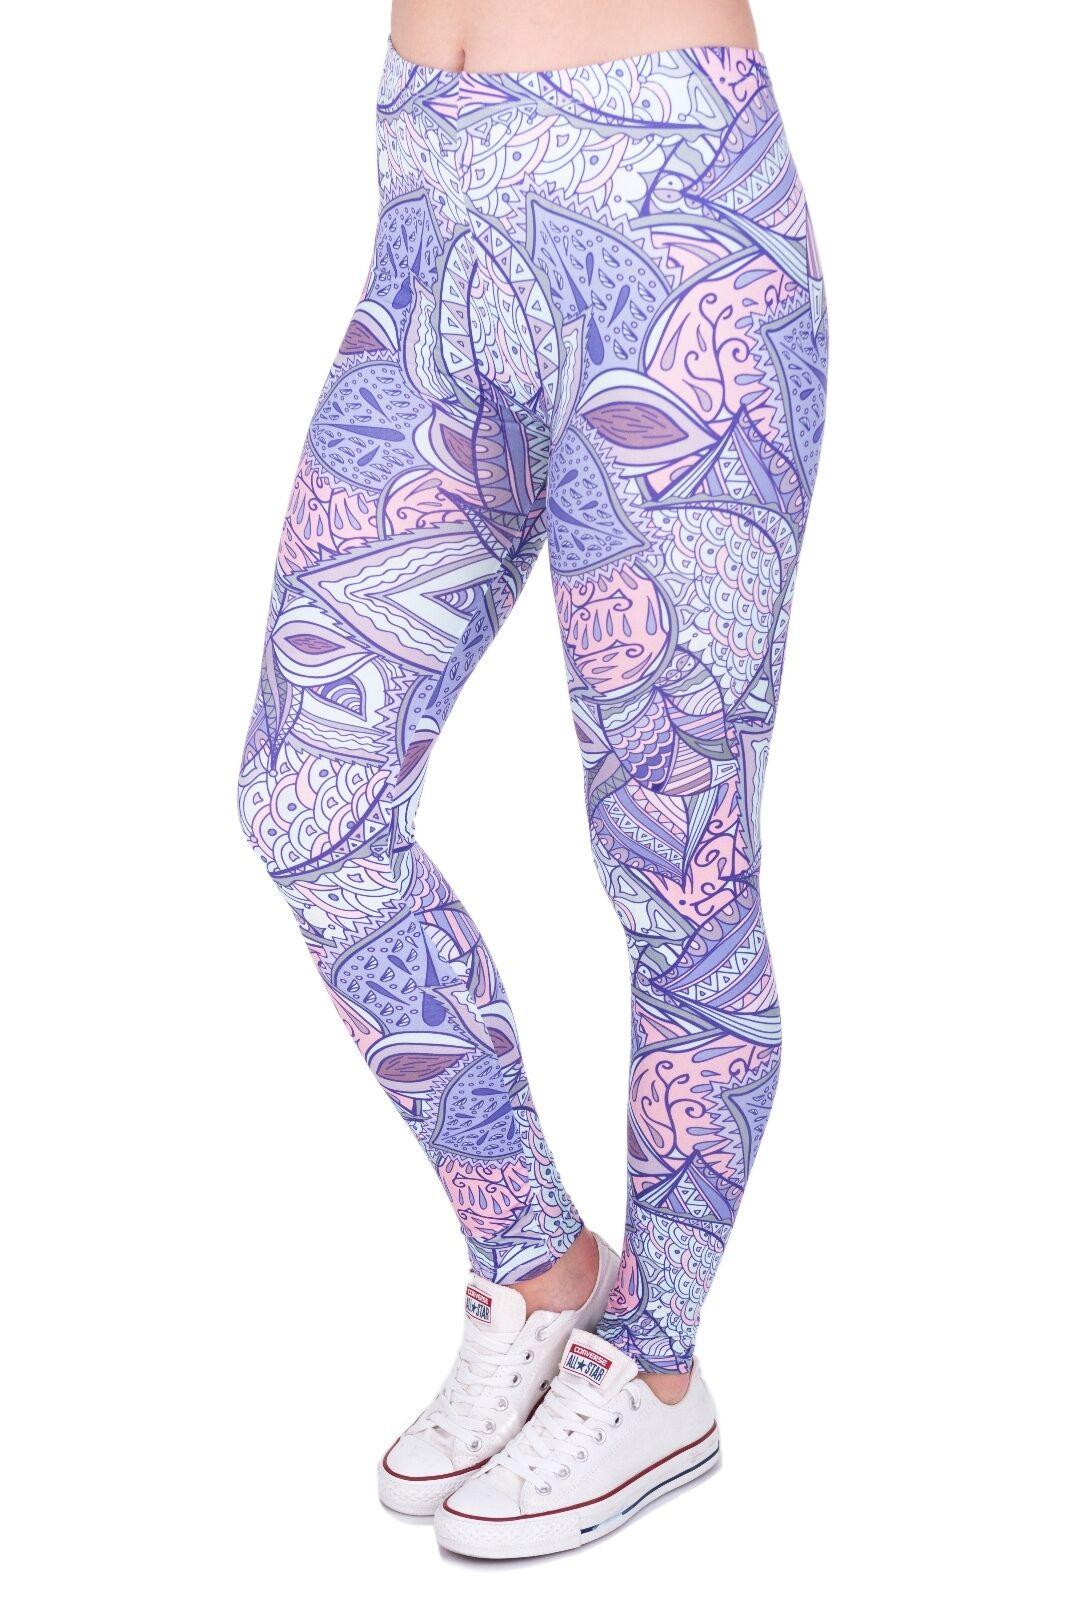 Damen 's Yoga Bedruckt Leggings dehnbar Training Joggen Fitness Hose Unterlage